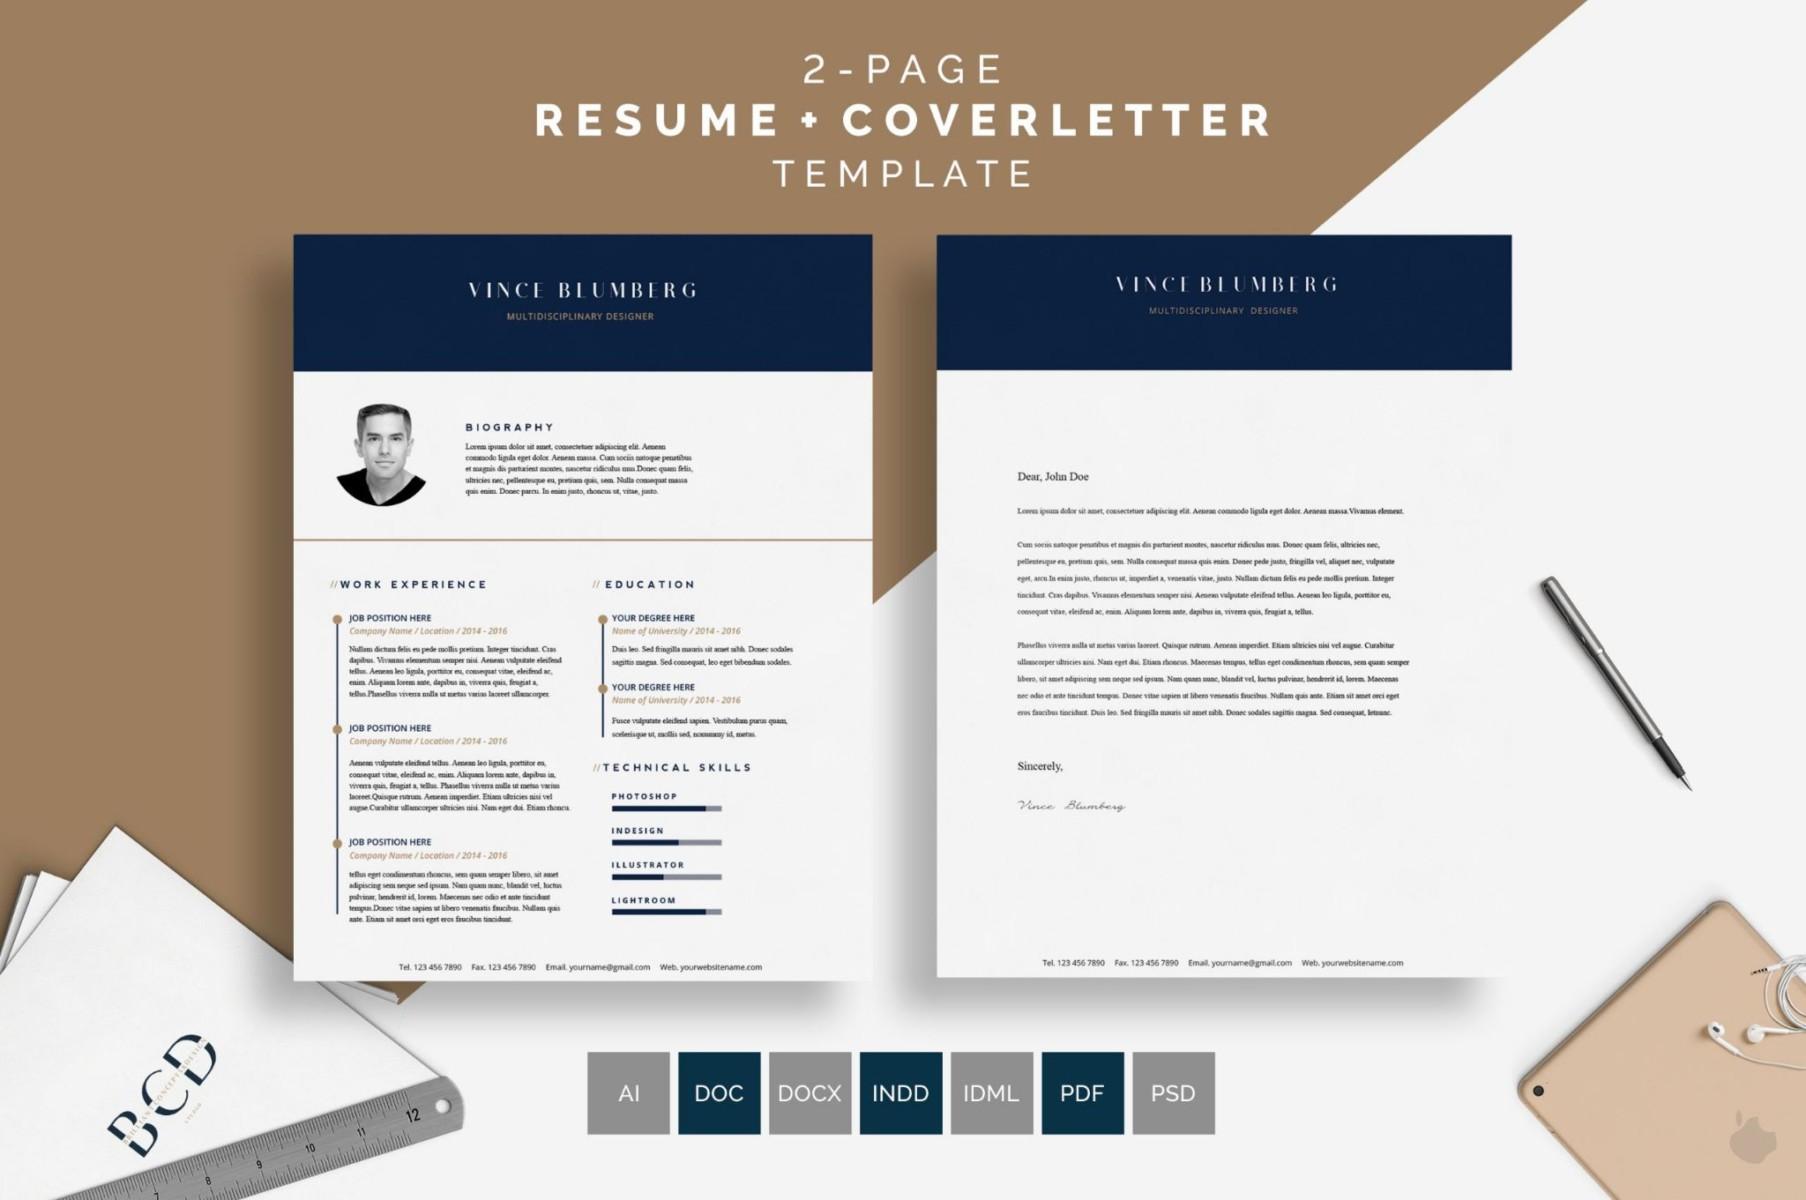 Web Developer Seo Analyst Cover